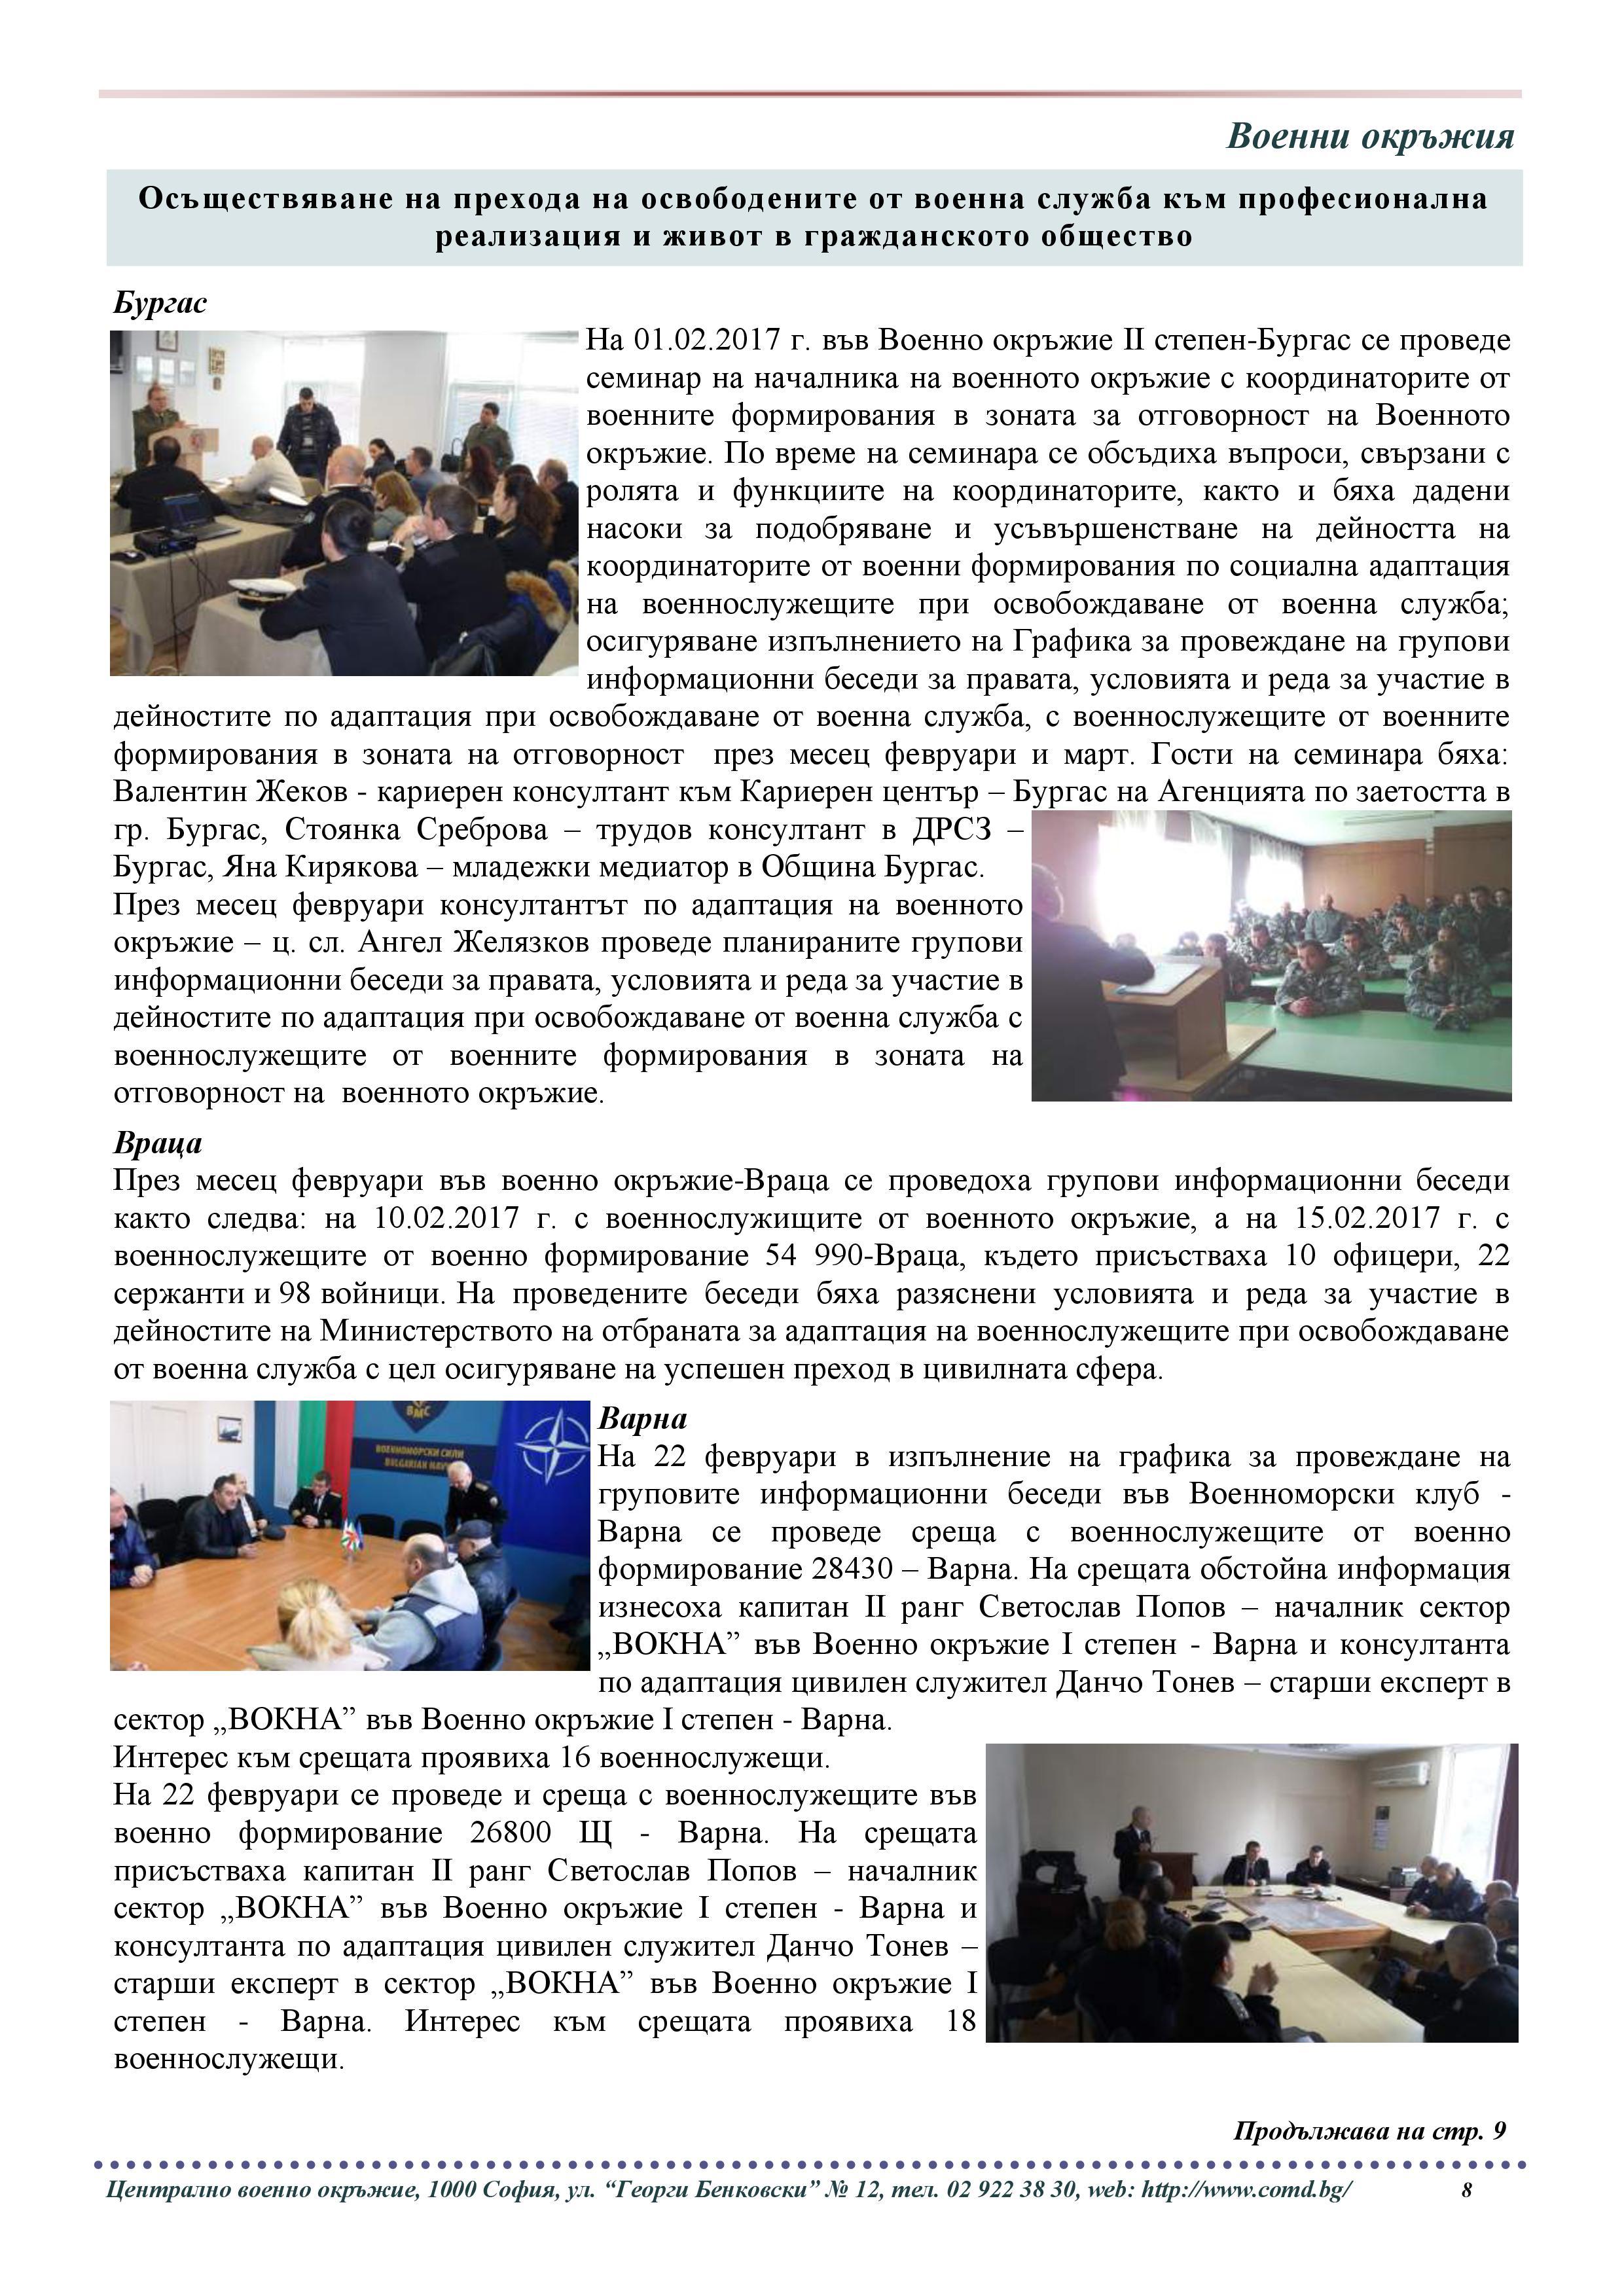 http://armymedia.bg/wp-content/uploads/2015/06/IB_2_2017g.compressed-za-izpra6tane-22.03.2017.page08.jpg